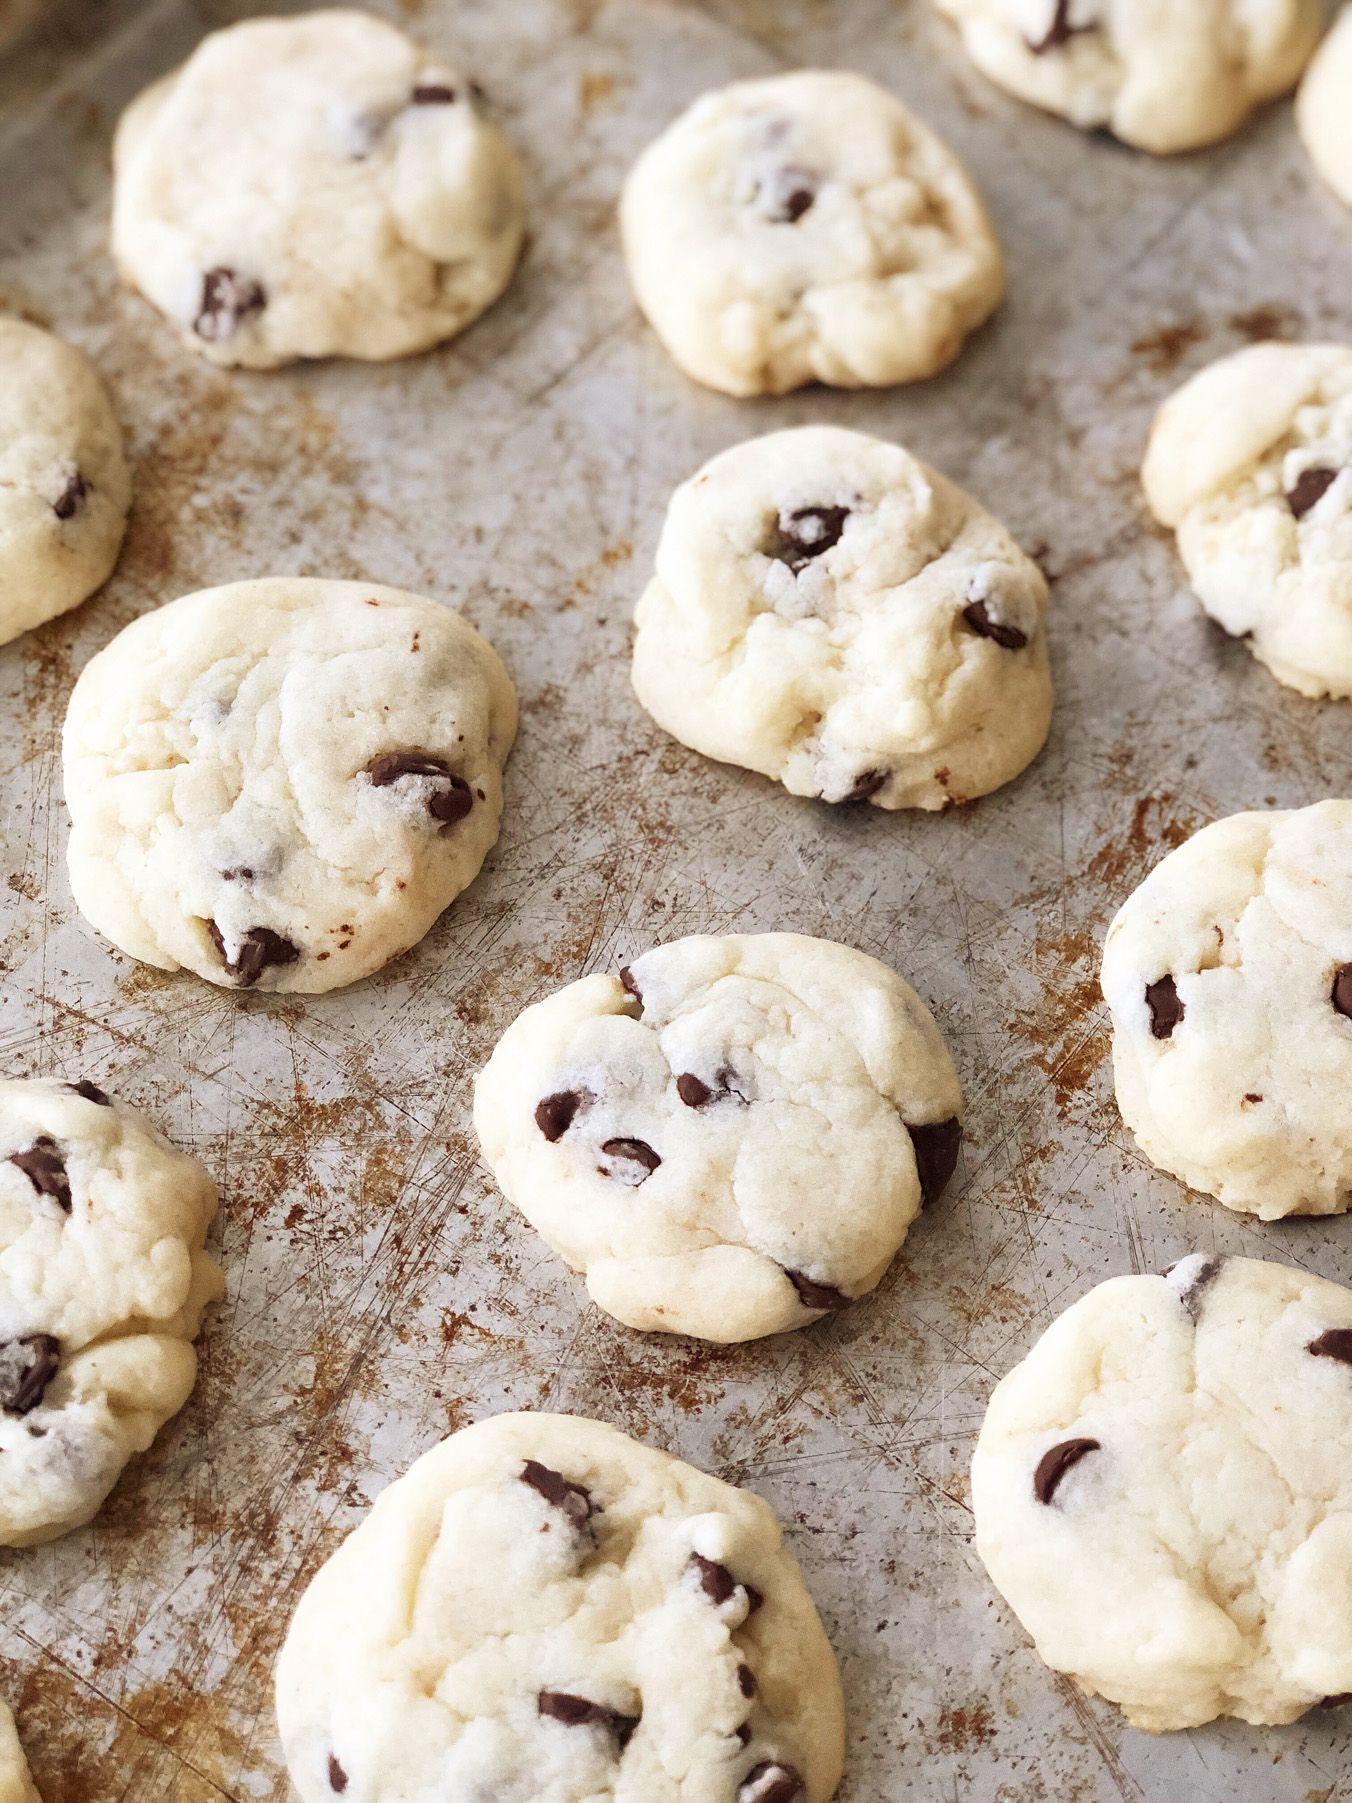 These Condensed Milk Chocolate Chip Cookies Taste Like A Shortbread Cookie Milk Chocolate Chip Cookies Chocolate Chip Cookies Sweetened Condensed Milk Recipes